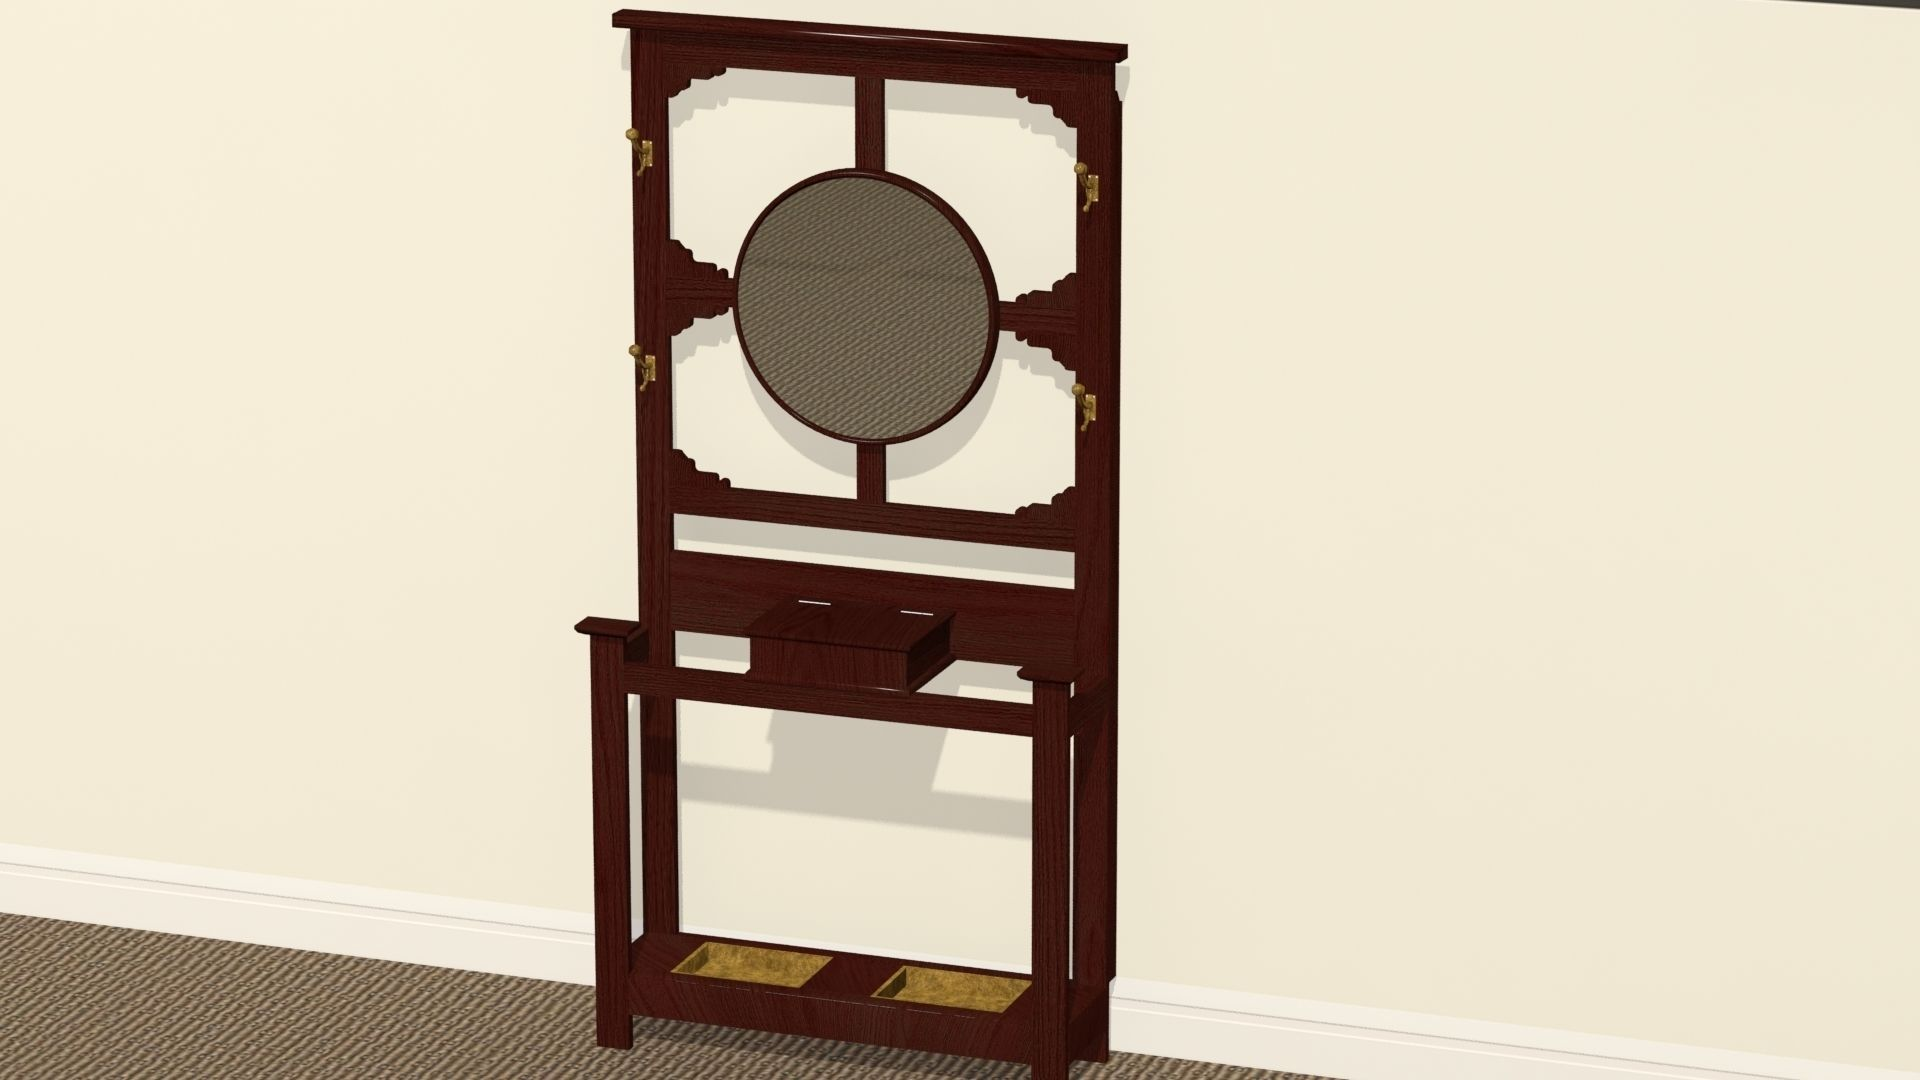 antique hat rack or hall stand 3d model